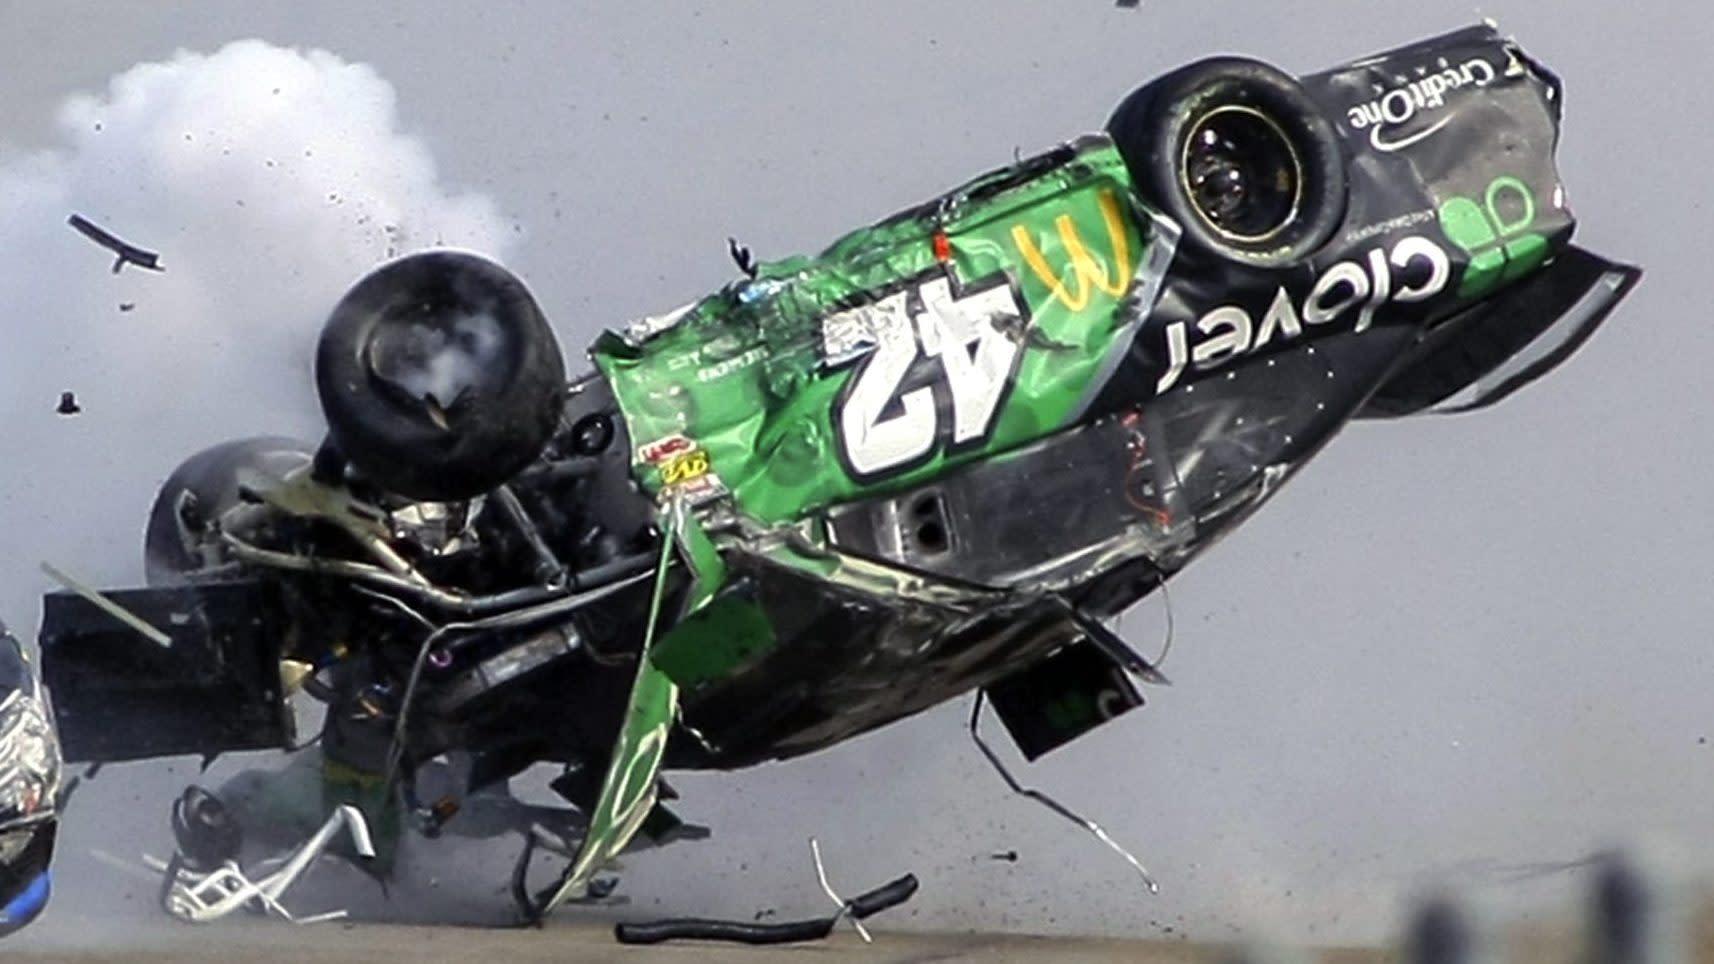 NASCAR releases findings from Kyle Larson's crash at Talladega